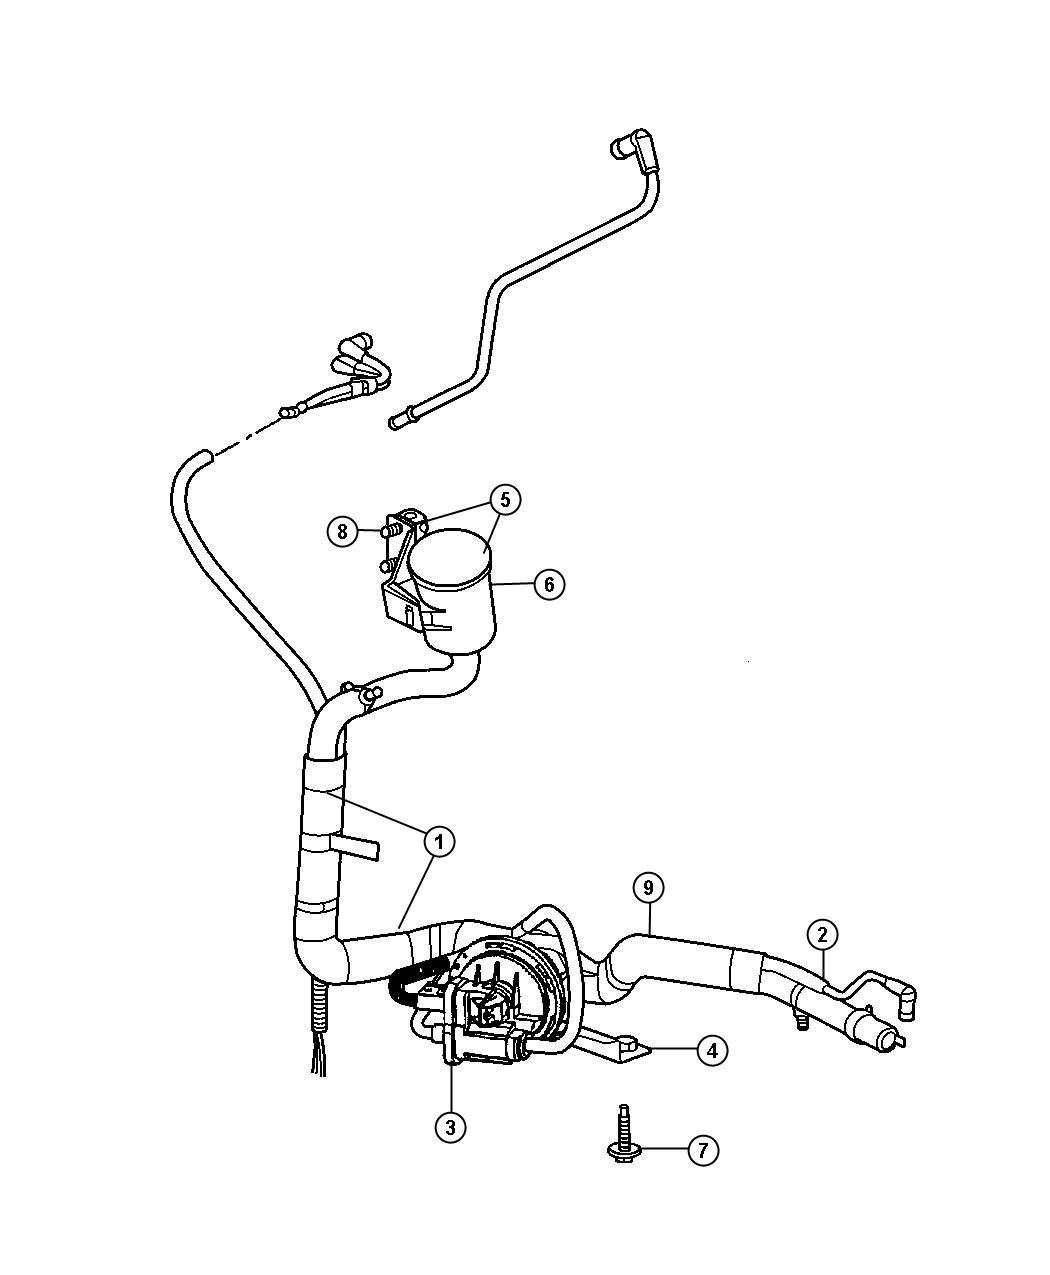 Dodge Grand Caravan Bracket. Leak detection pump